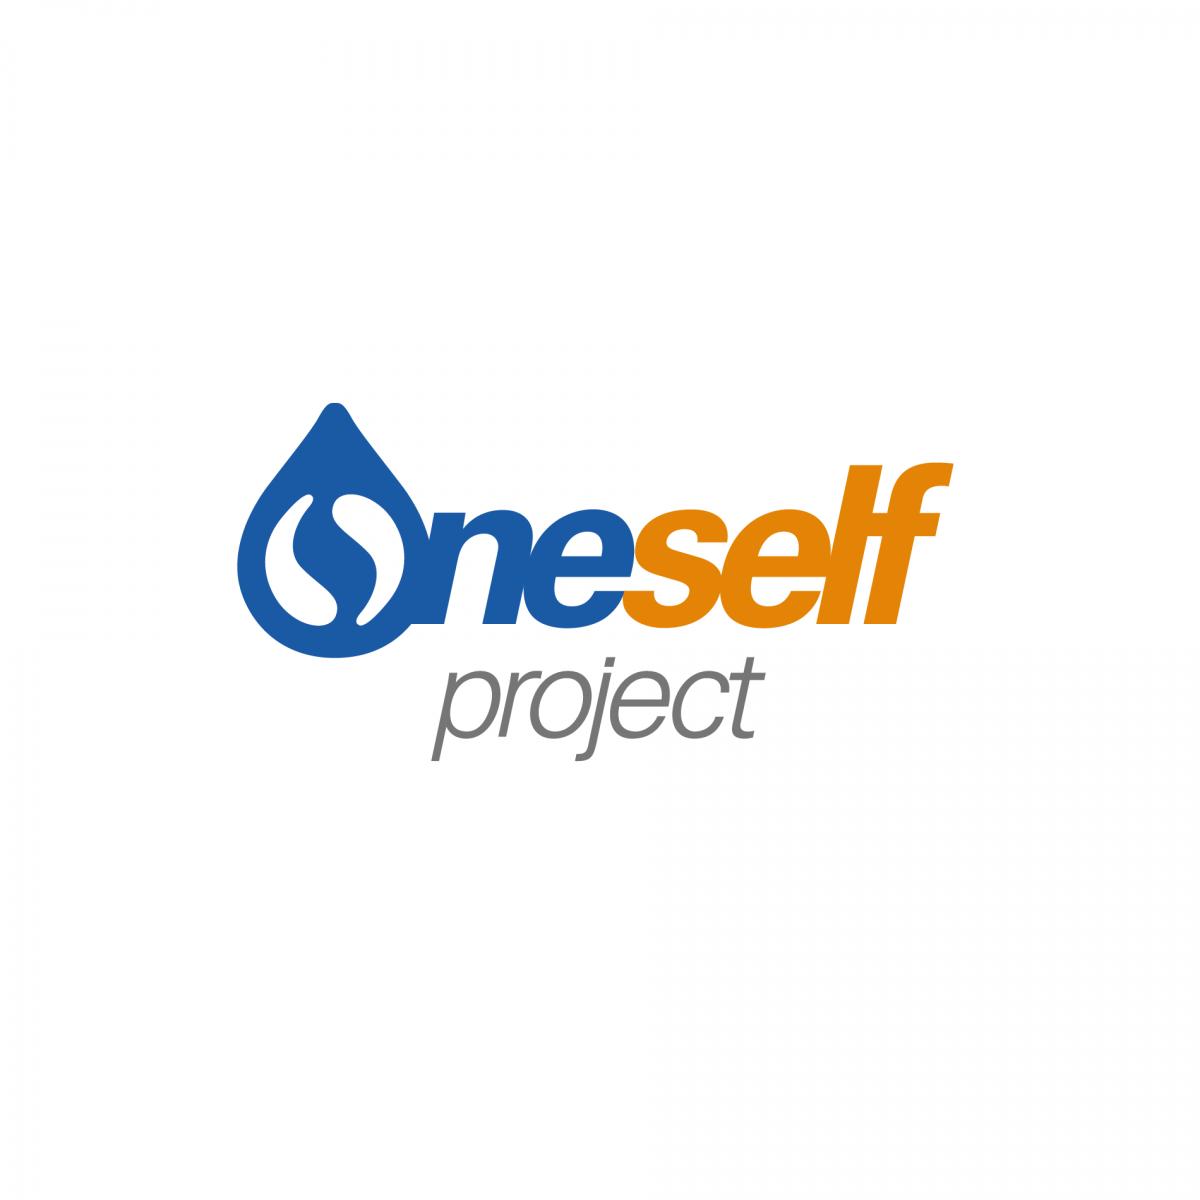 Oneself Project ワンセルフ・プロジェクト - 横浜建物管理協同組合・神奈川県中小企業中央会|VI ロゴシンボル|神奈川県横浜市